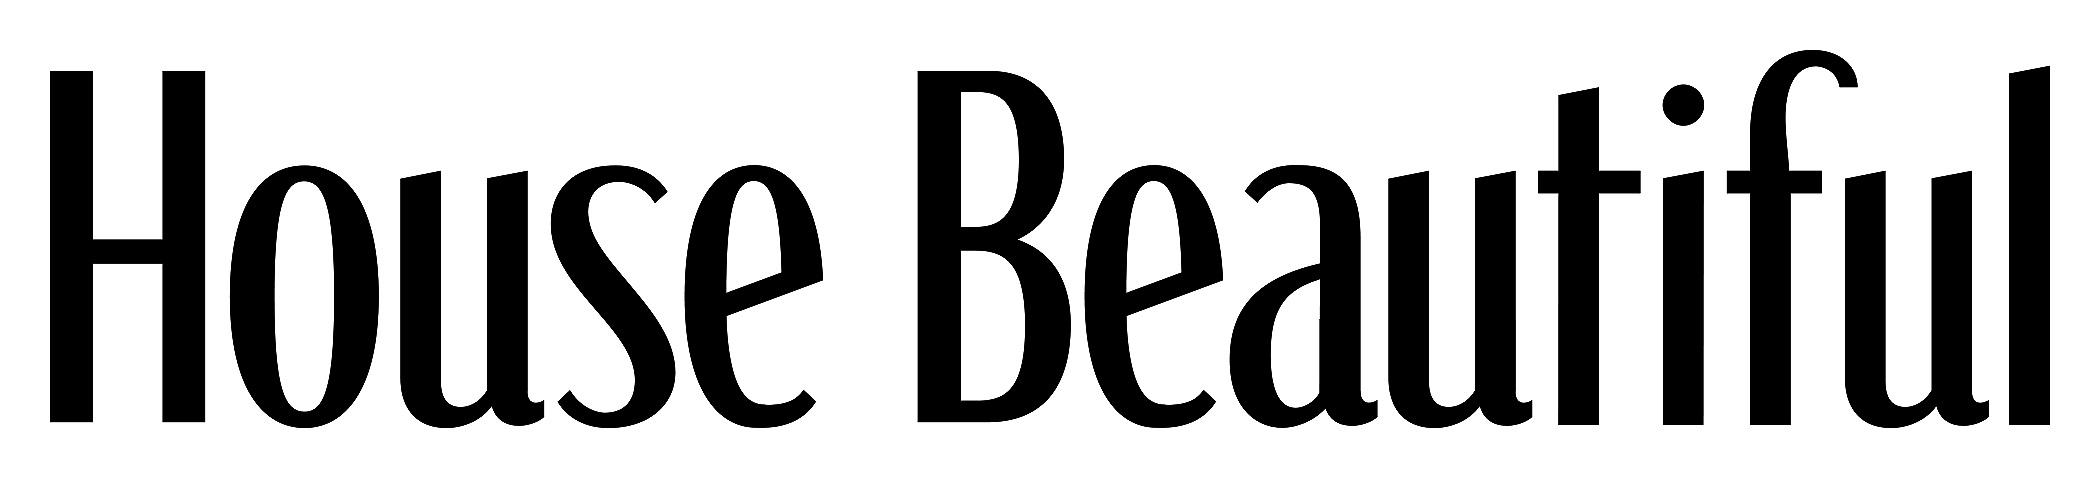 house_beautiful_2019_logo.jpg